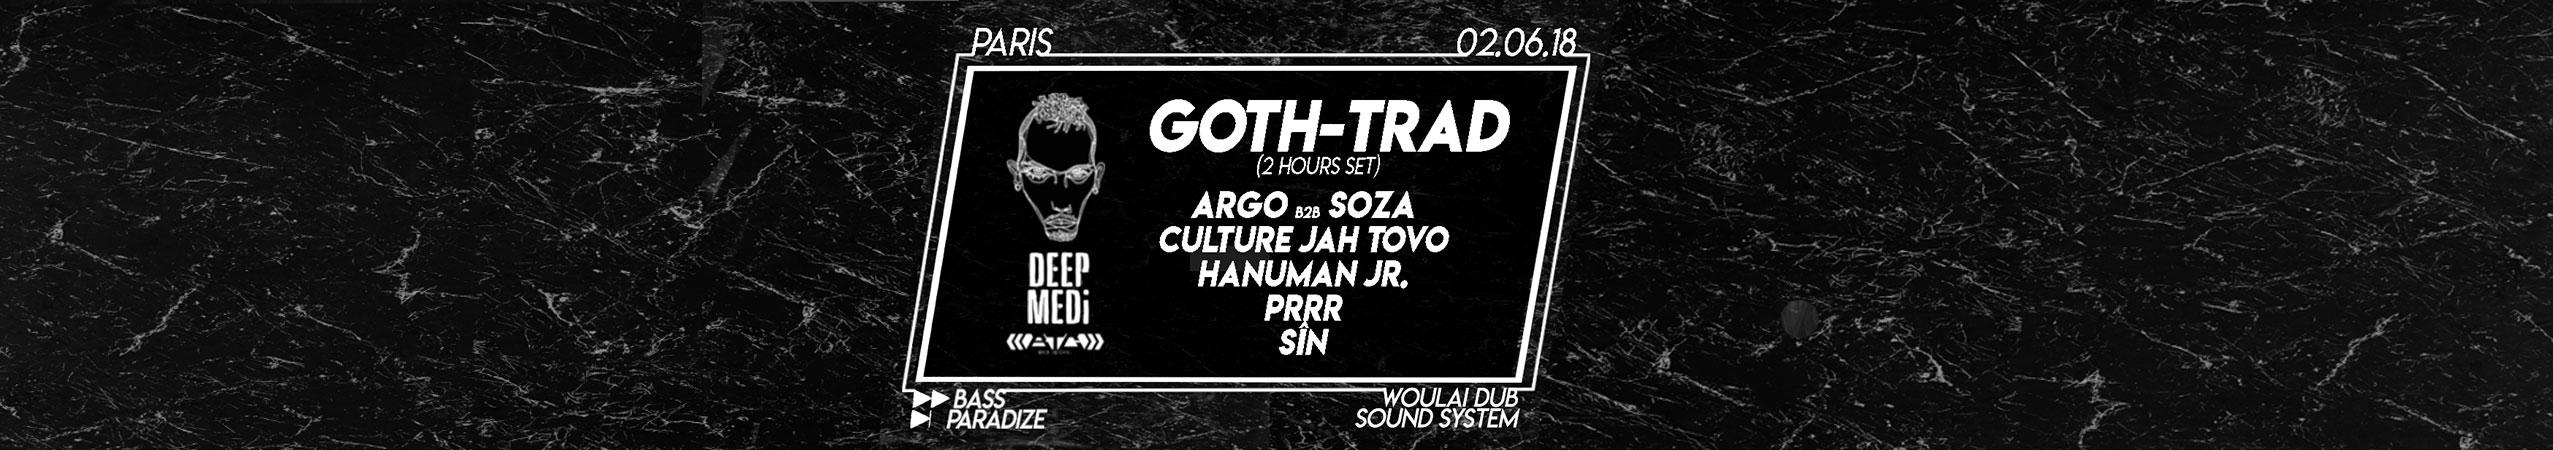 Bass Paradize : Goth-Trad ◇ Woulai Dub Sound System